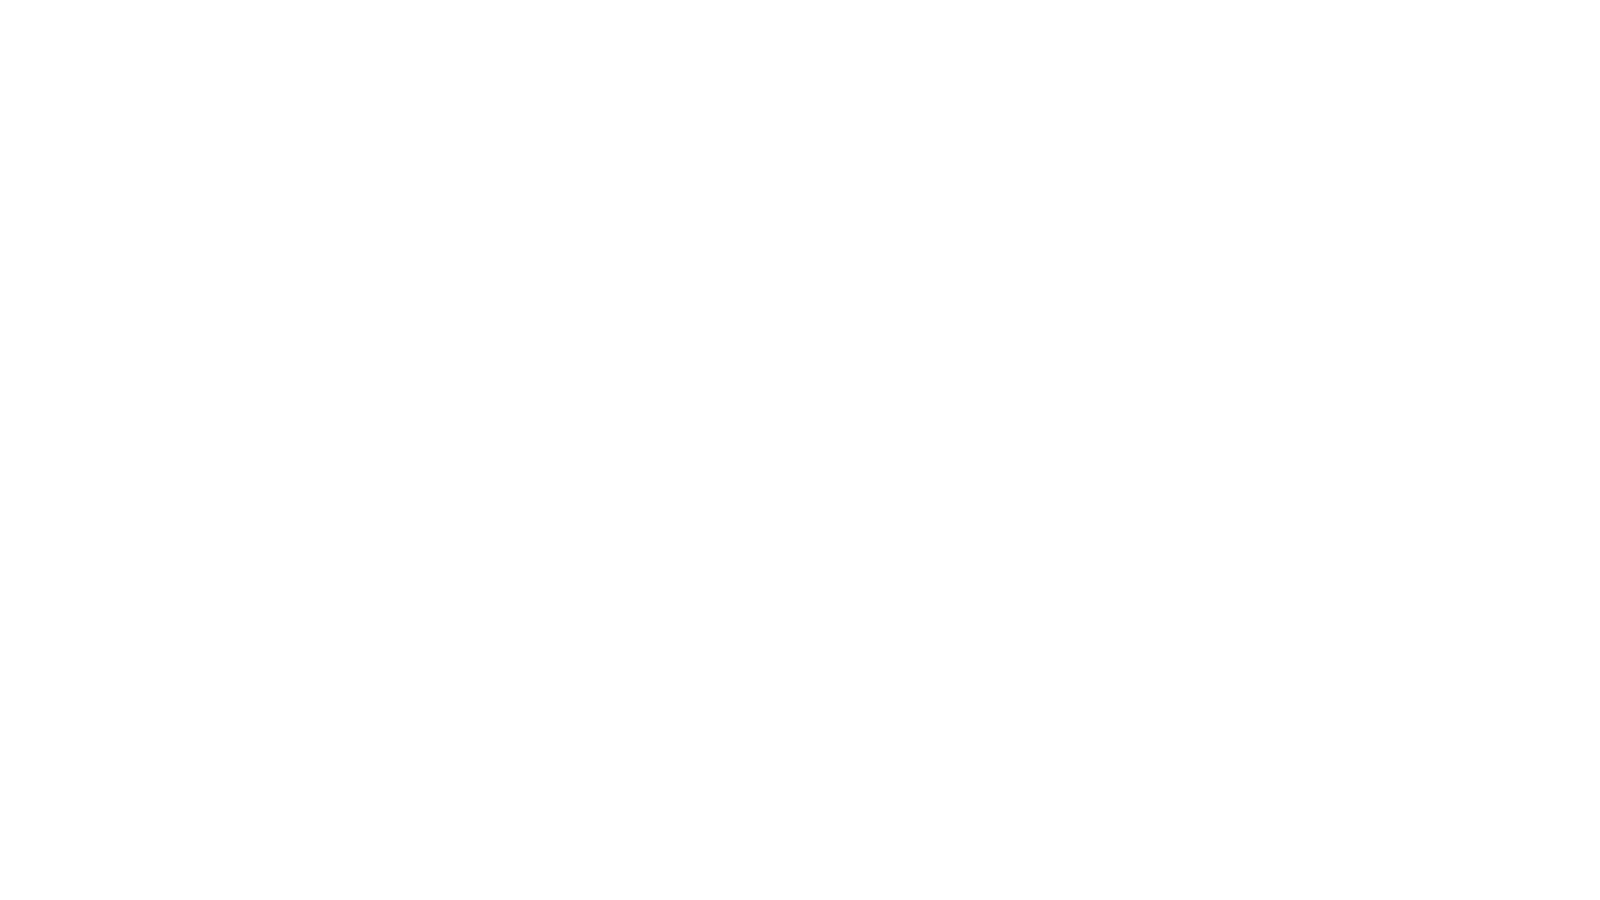 BOSS: Businesses Of Superior Standards  Steve Spurgeon, owner and founder of BOSS Group LI, sat down on a Zoom call to interview Josh Spitalnik of Spitalnik & Spitalnik, P.C.!